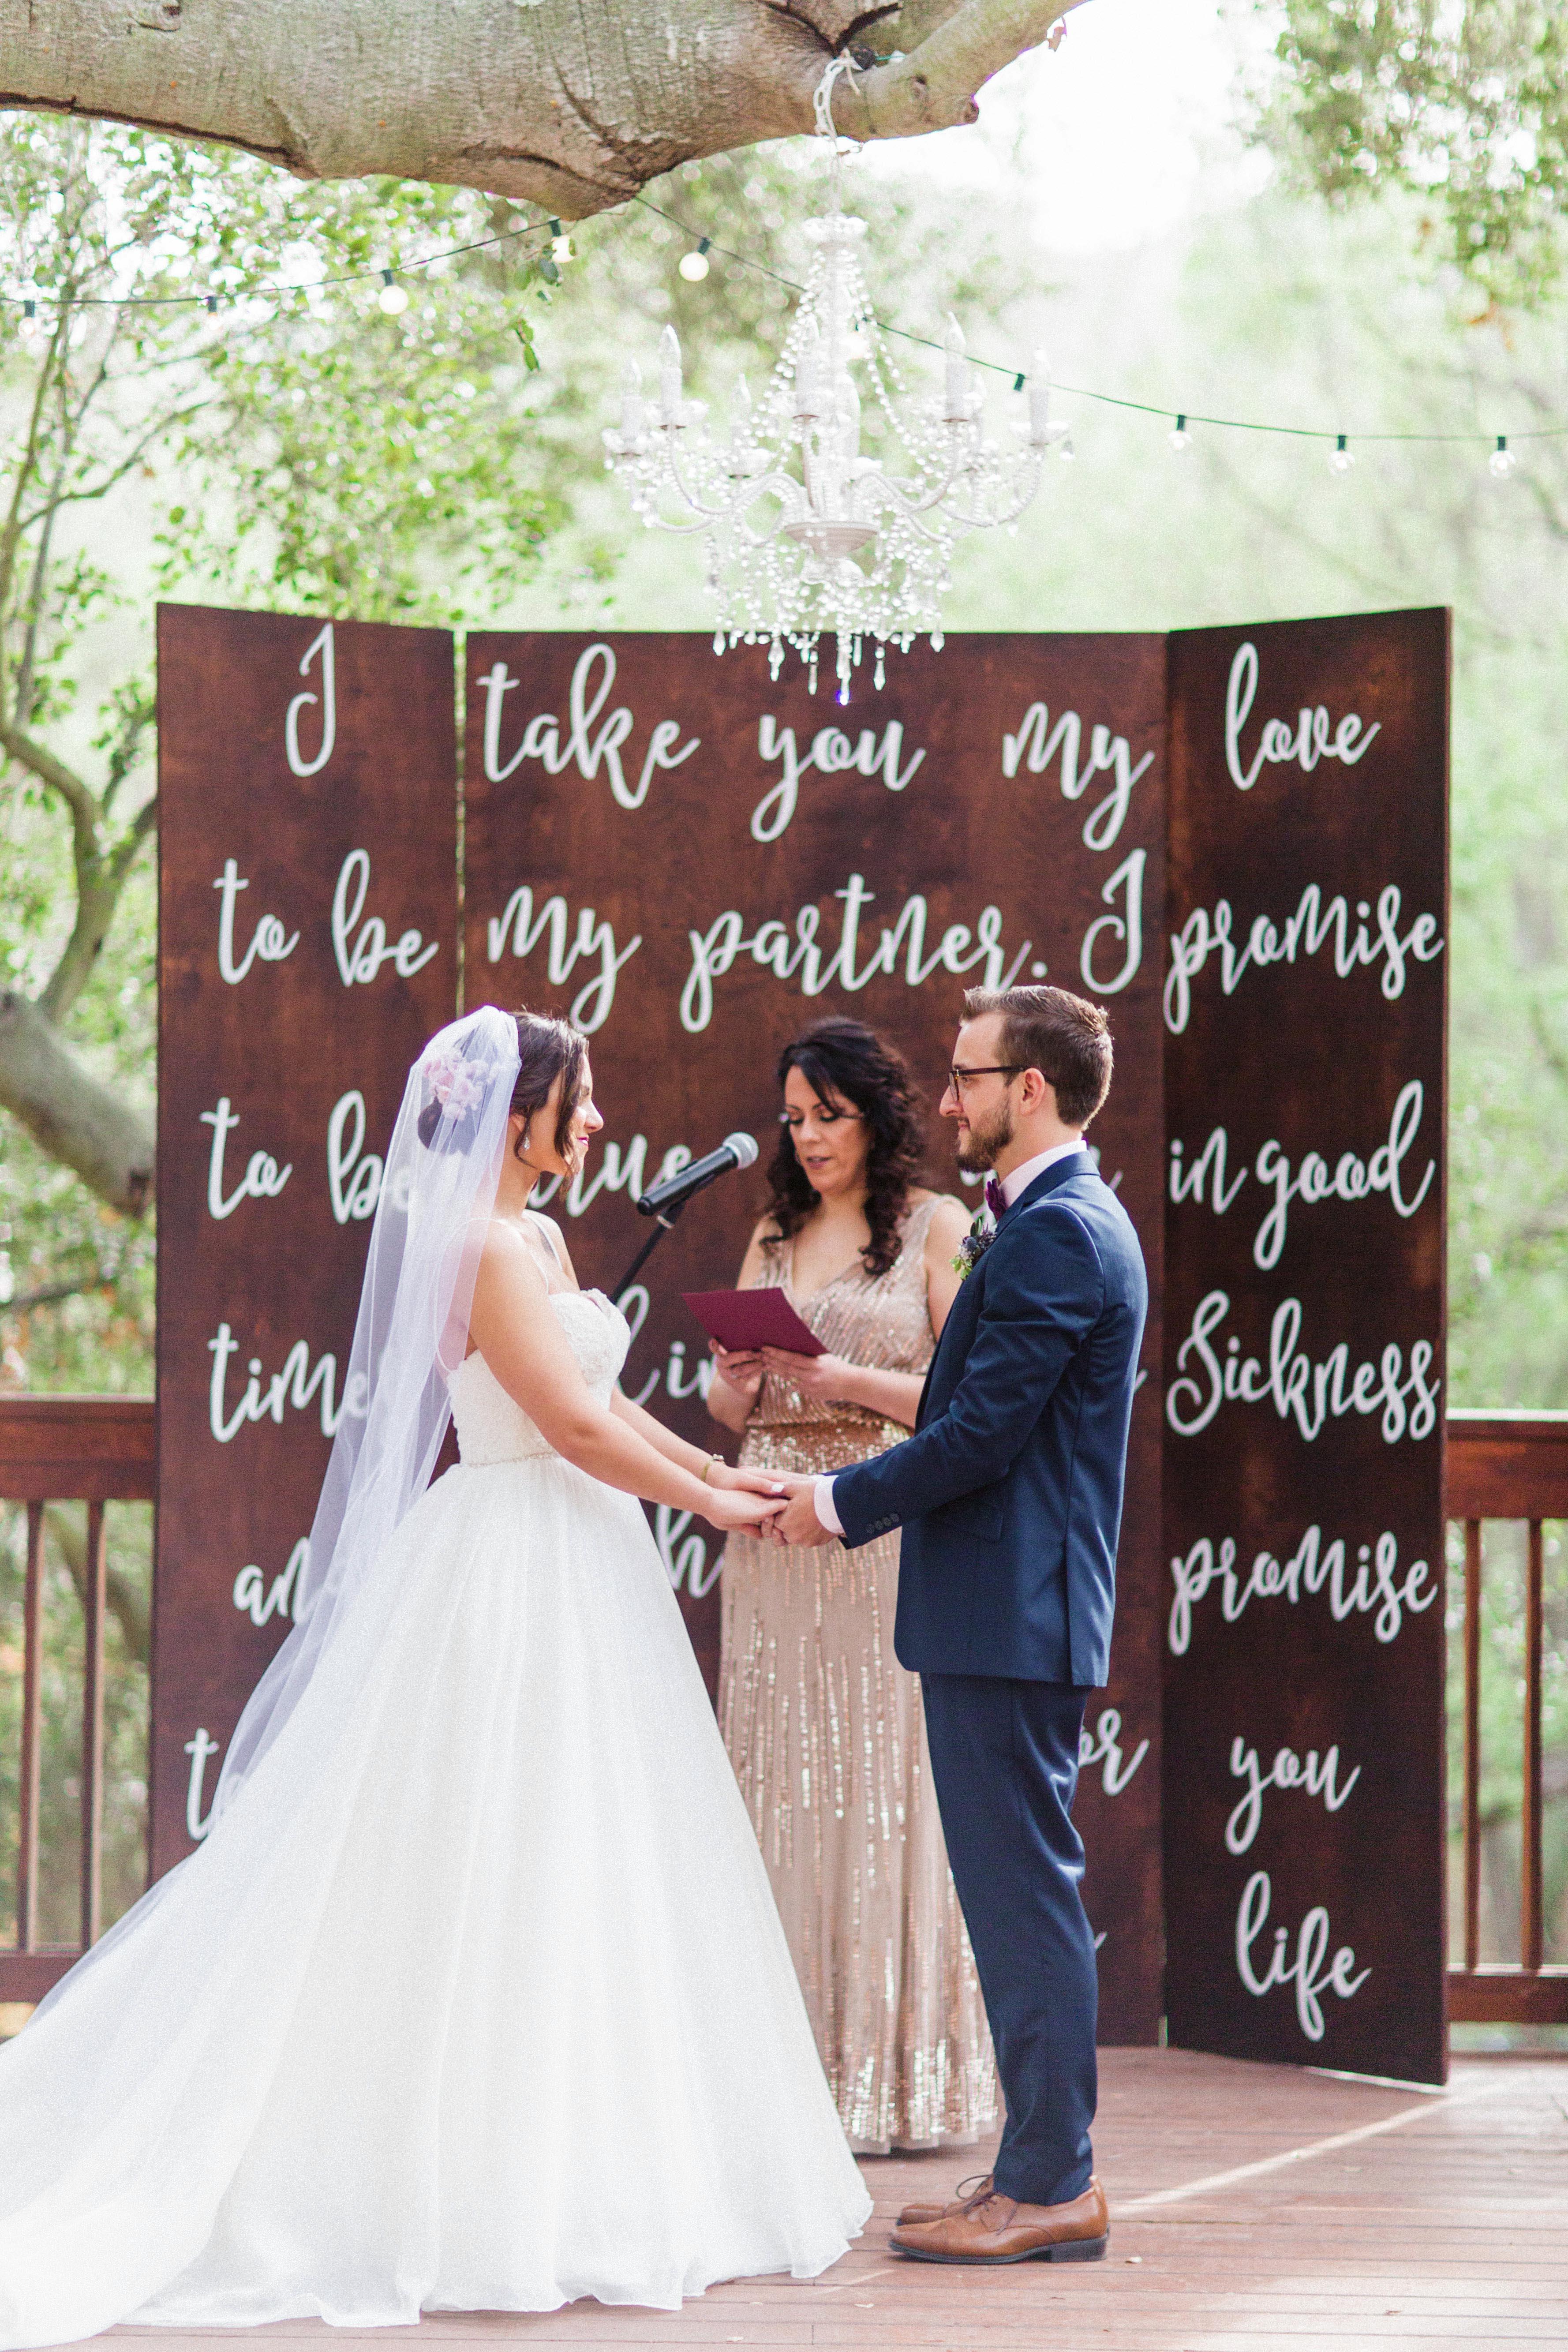 wedding ceremony backdrop white type on boards